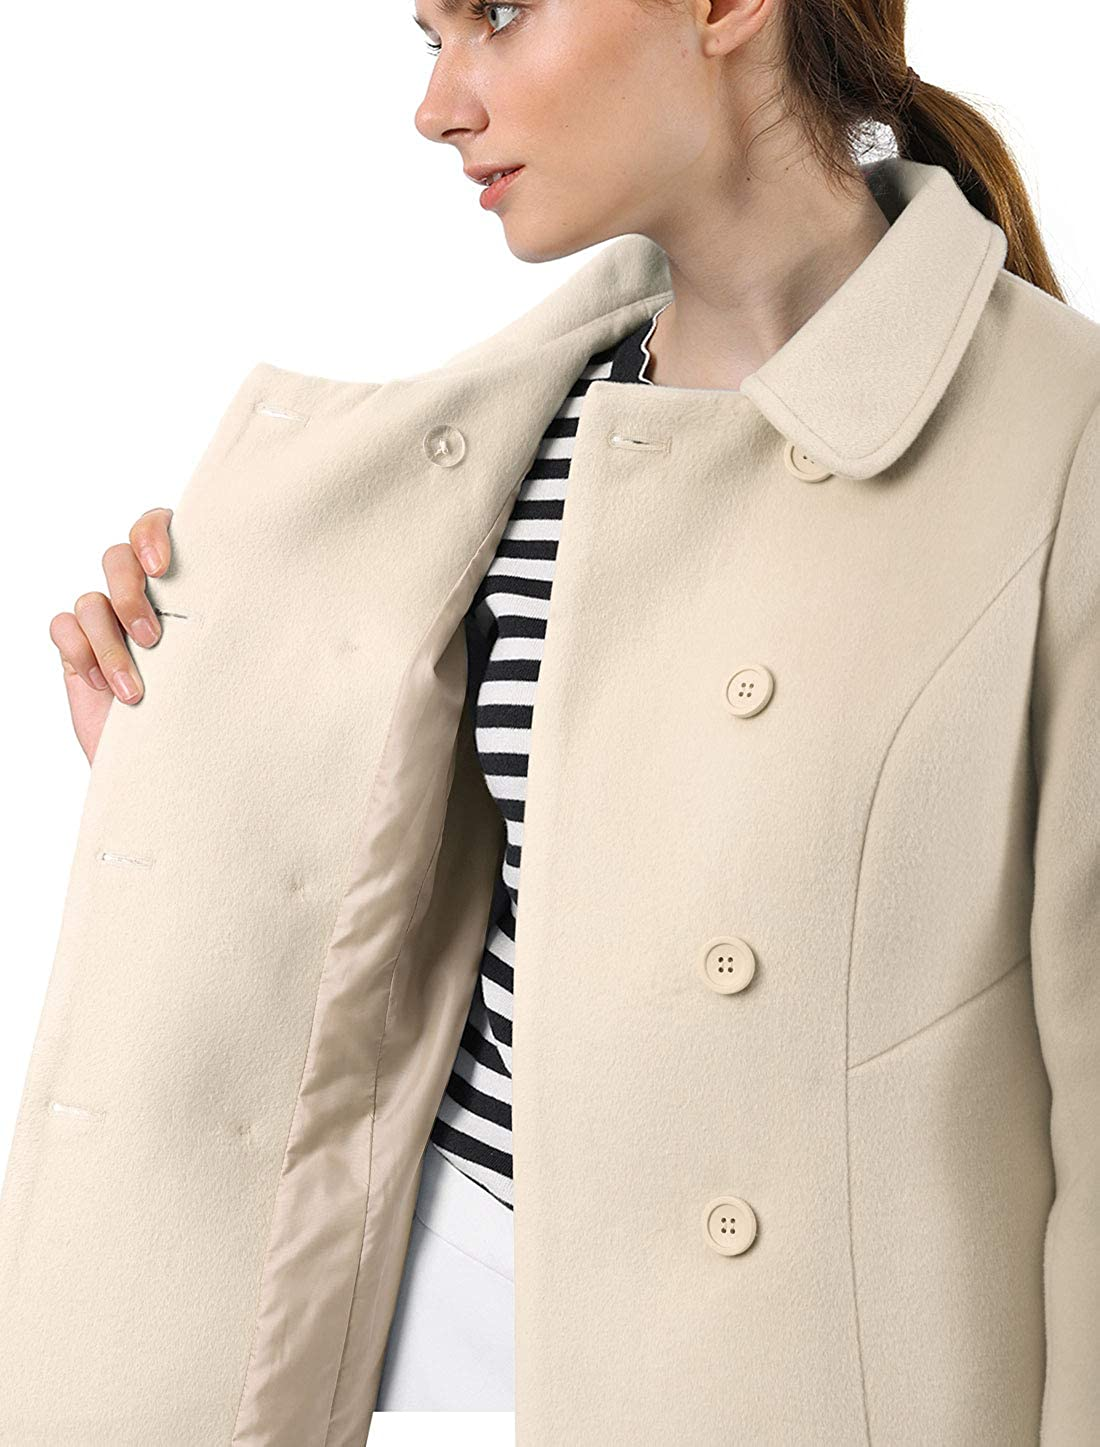 Allegra K Women's Trench Coat Peter Pan Collar Double Breasted Trench Coat Cream White